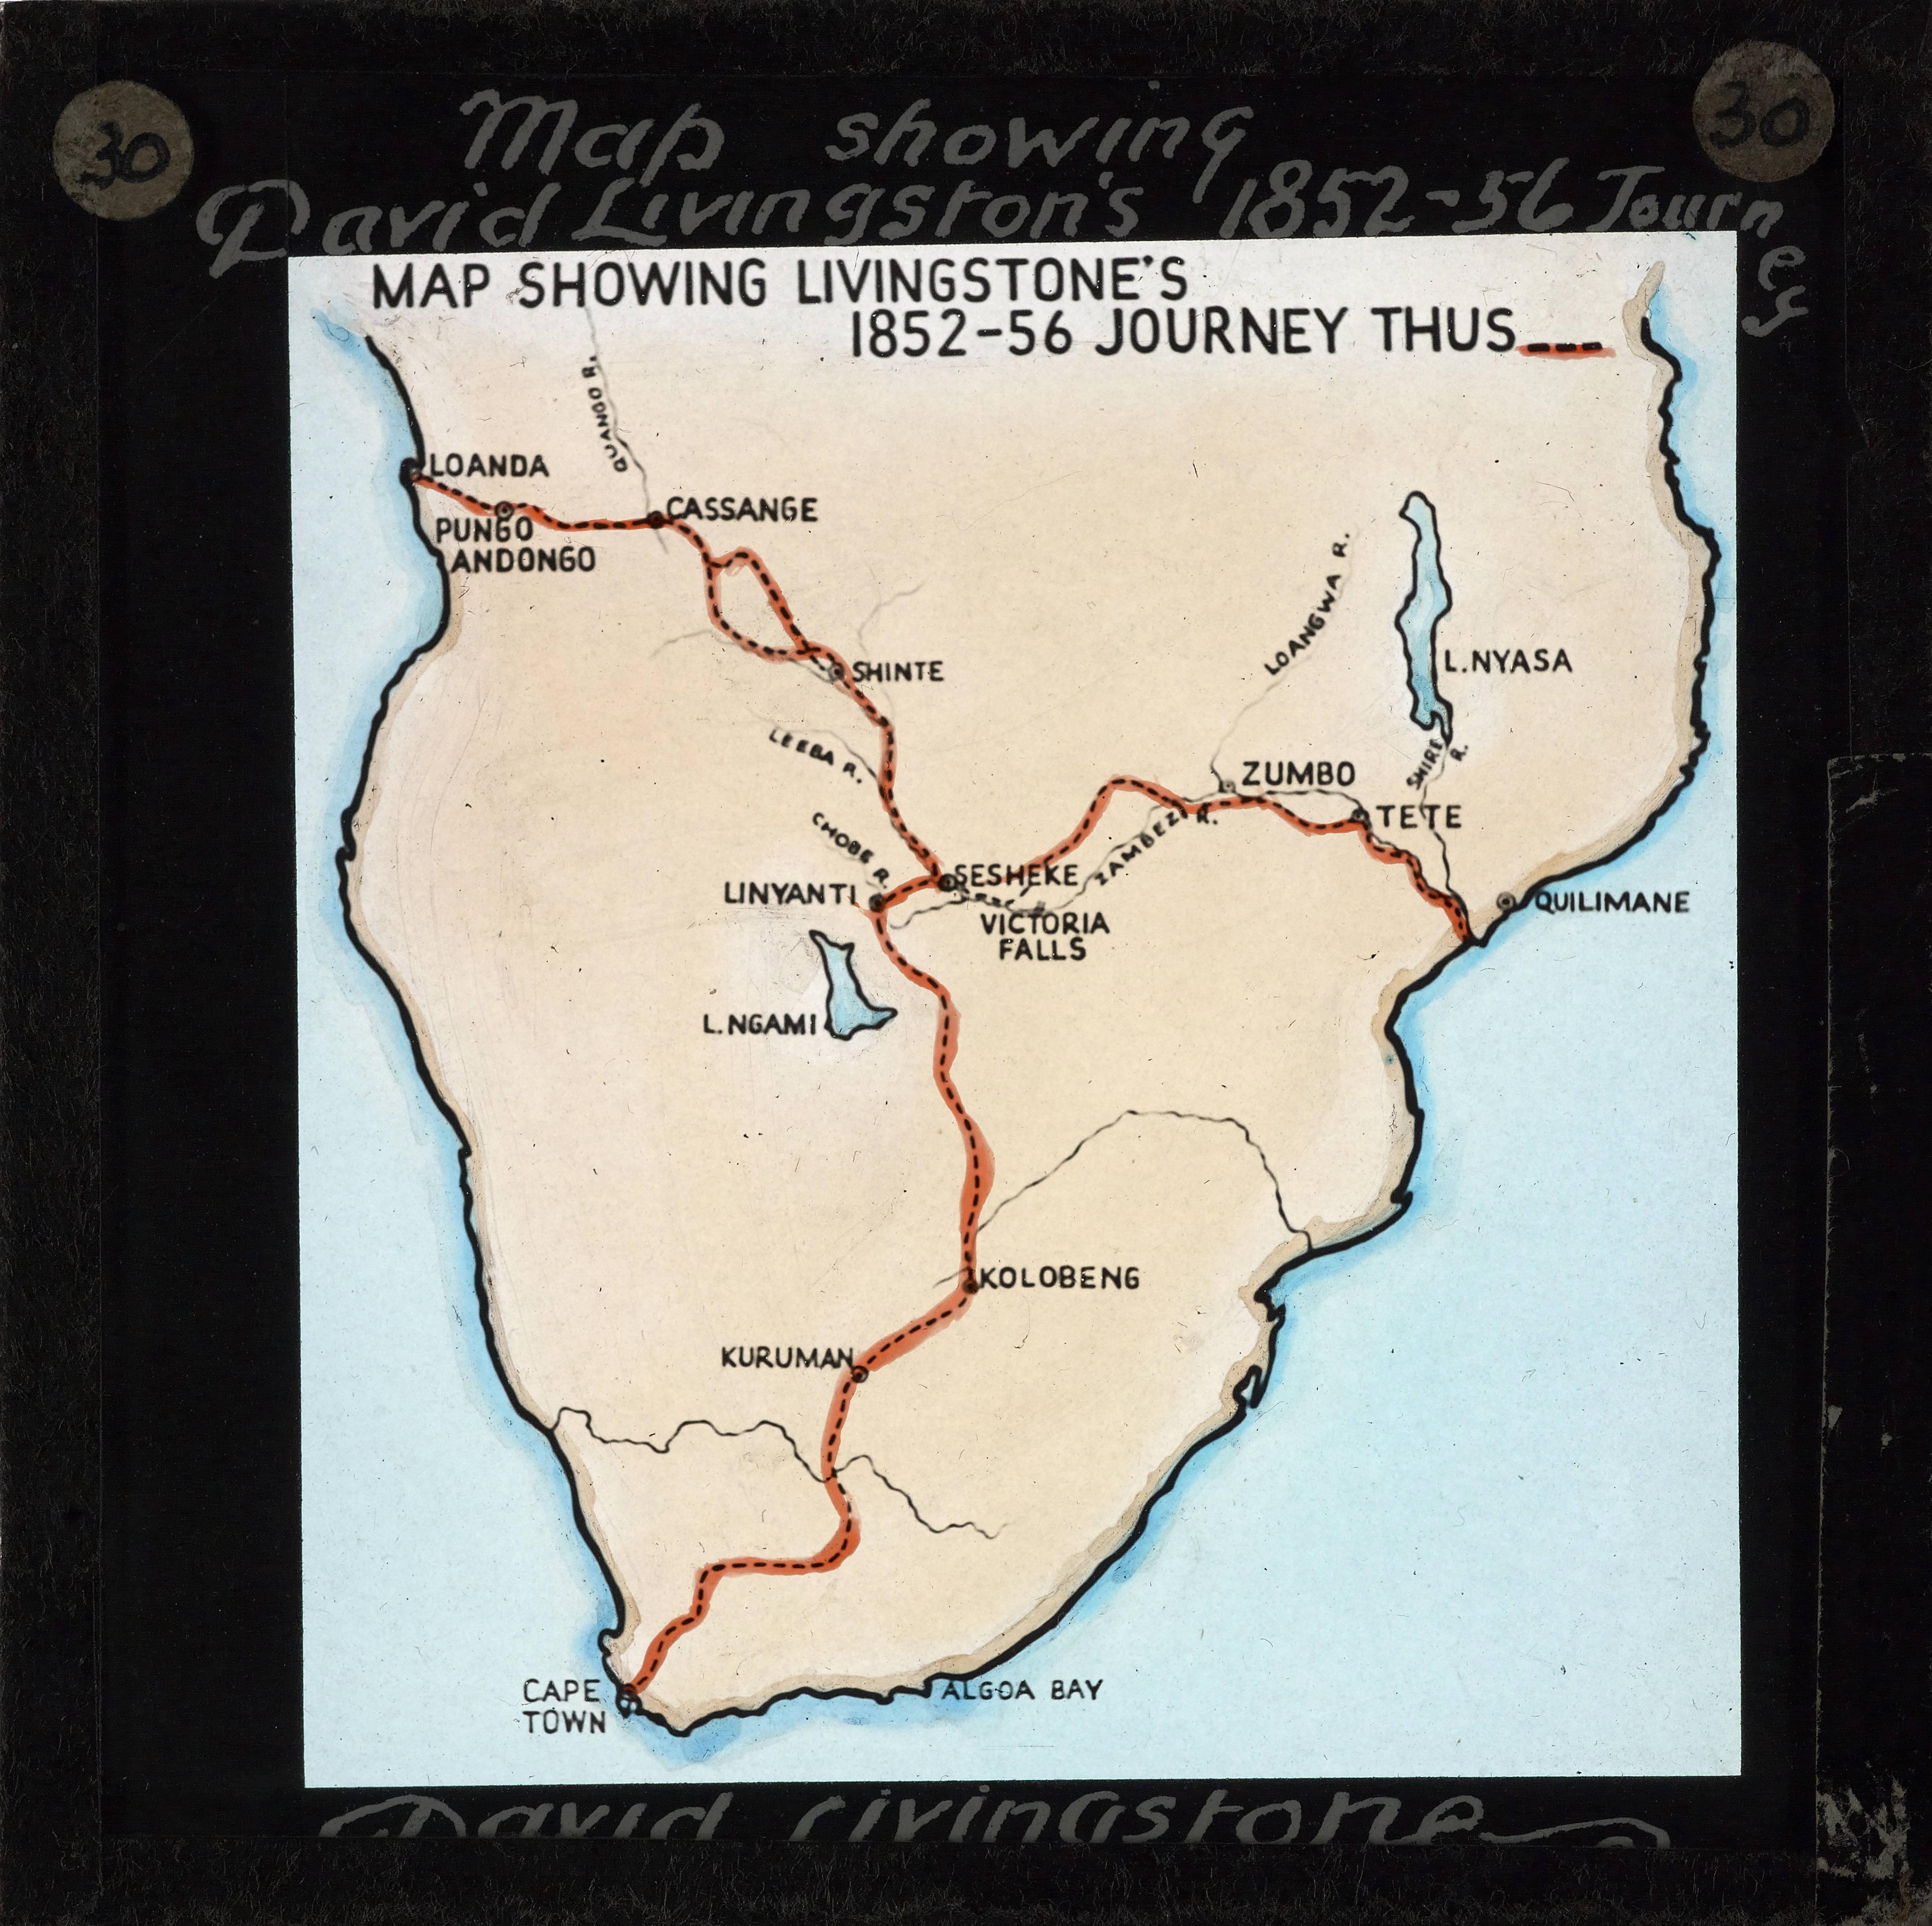 Livingstone Africa Map File:Map Showing David Livingstone's Journey, Africa, ca.1852 ca